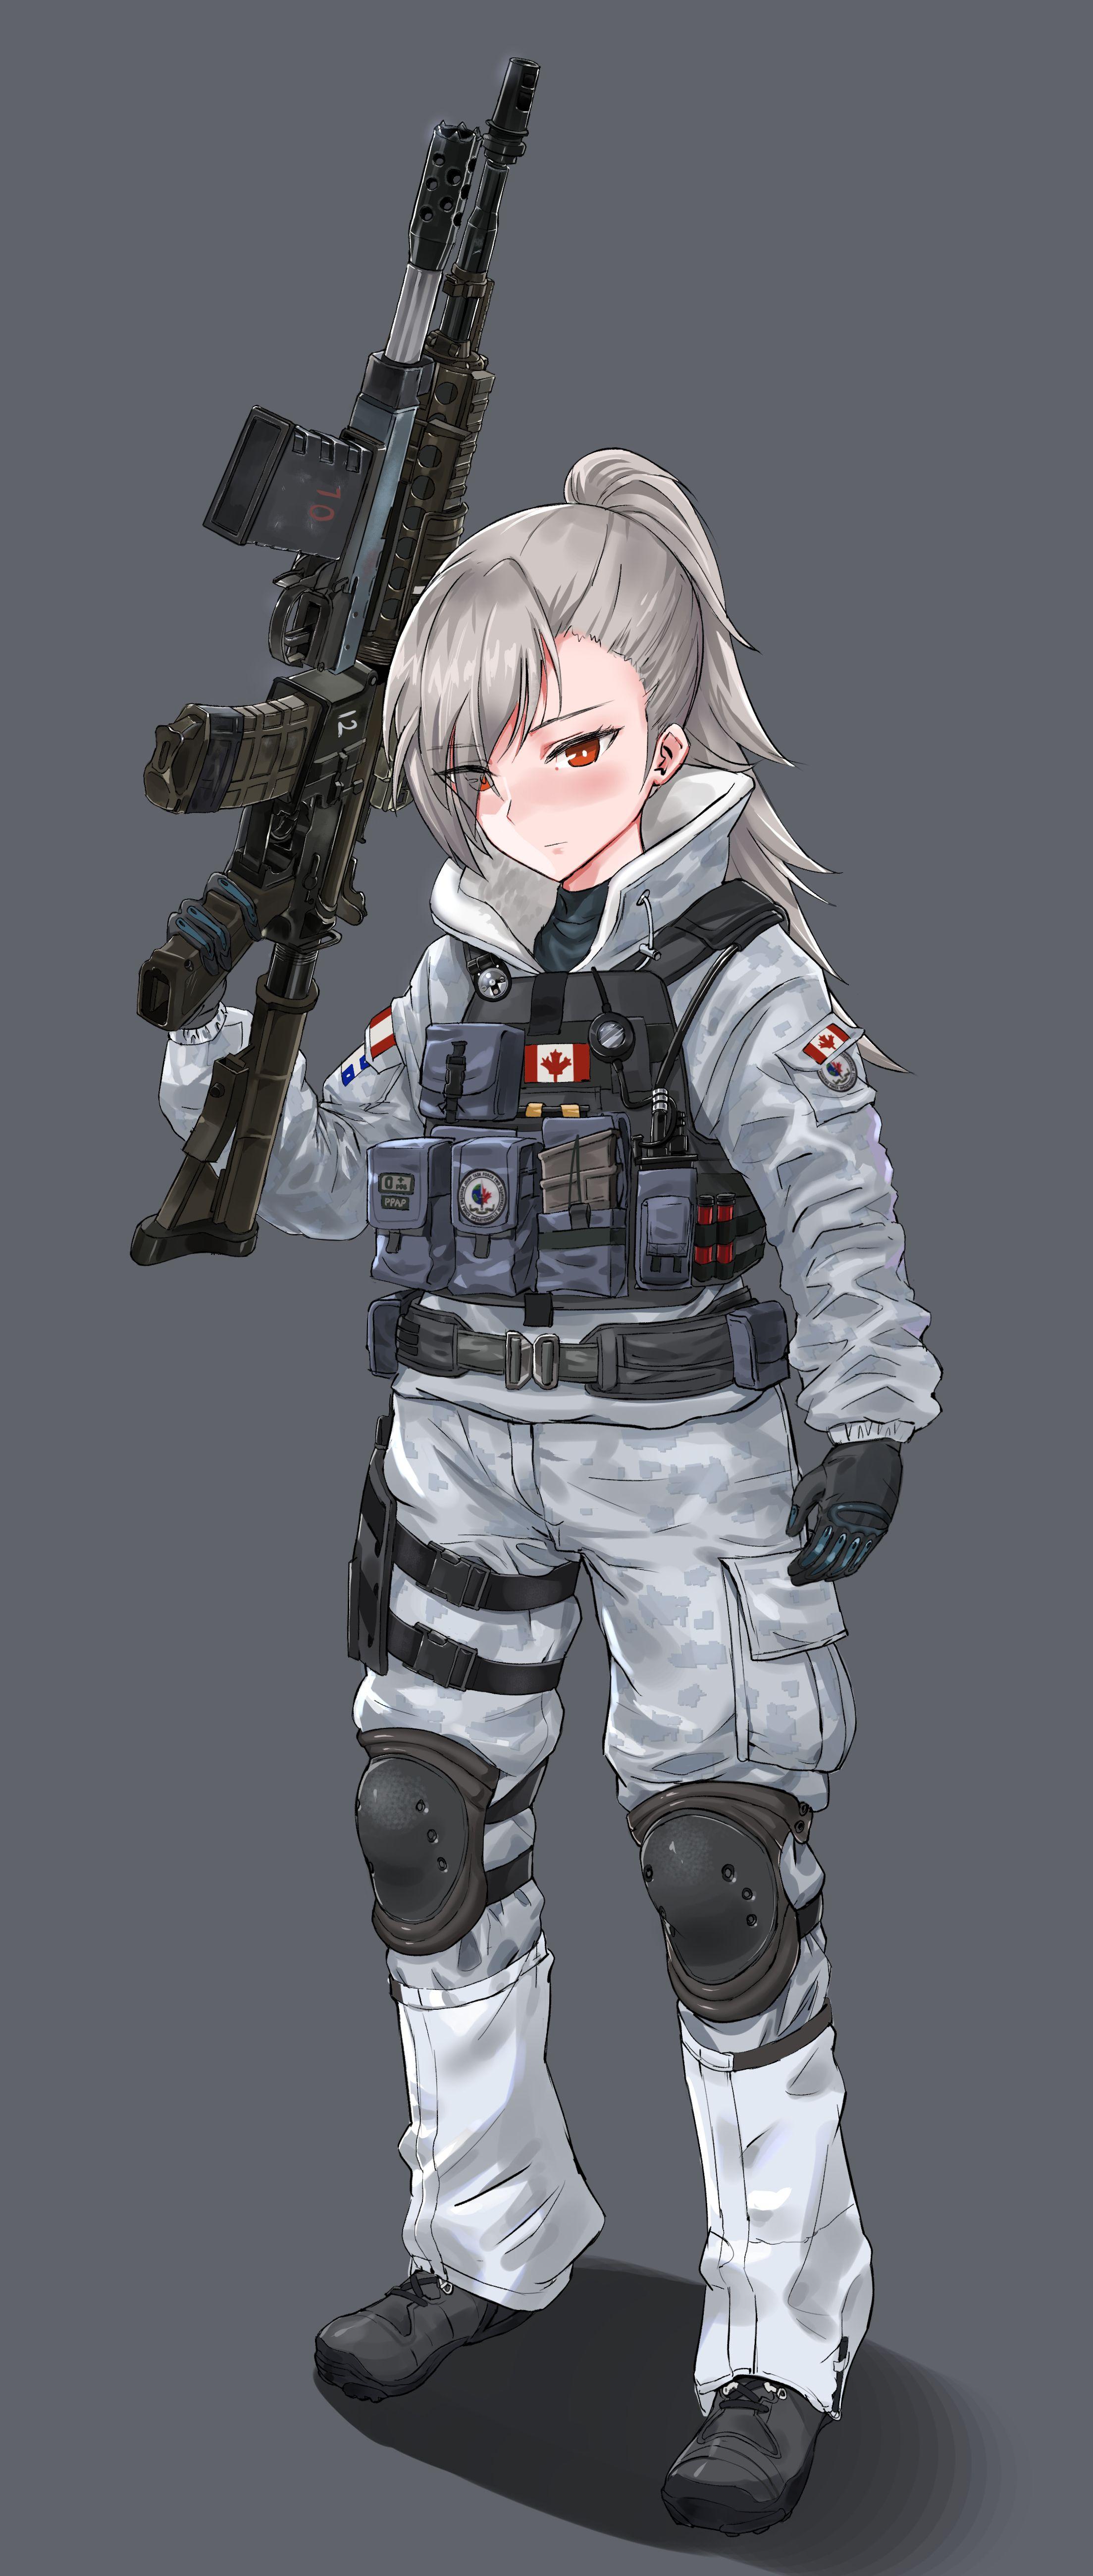 Safebooru 1girl Absurdres Belt Buck Rainbow Six Siege